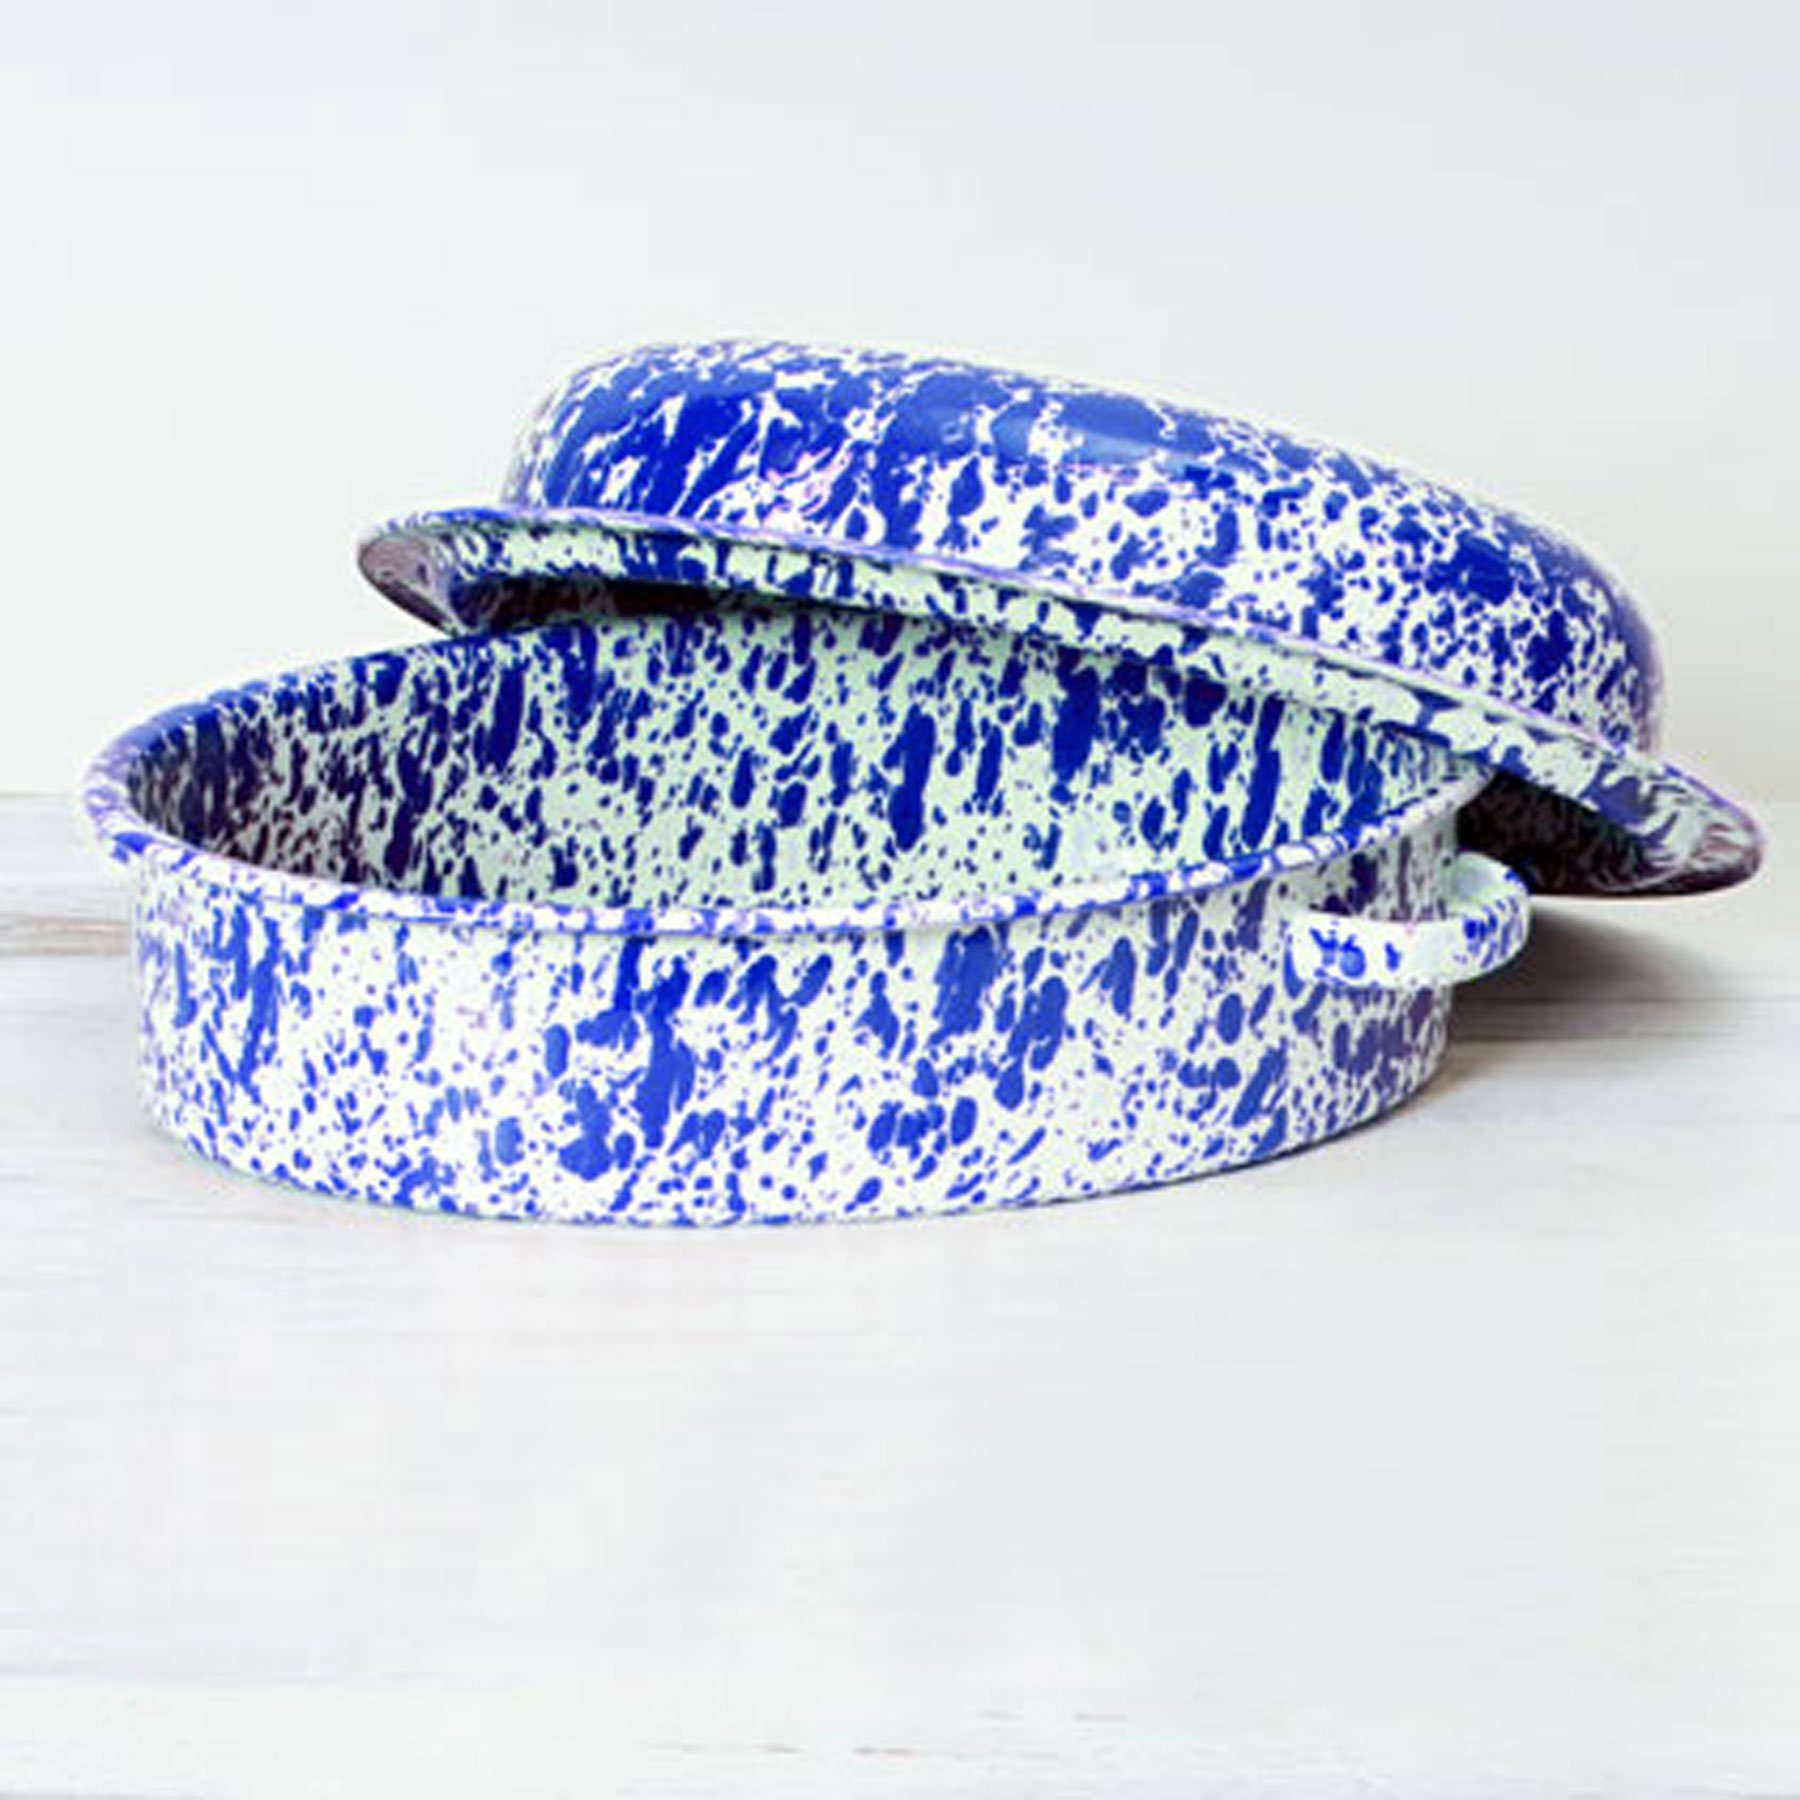 Enamelware Covered Oval Roaster, 9.25 x 12.75 inches, Blue/White Splatter